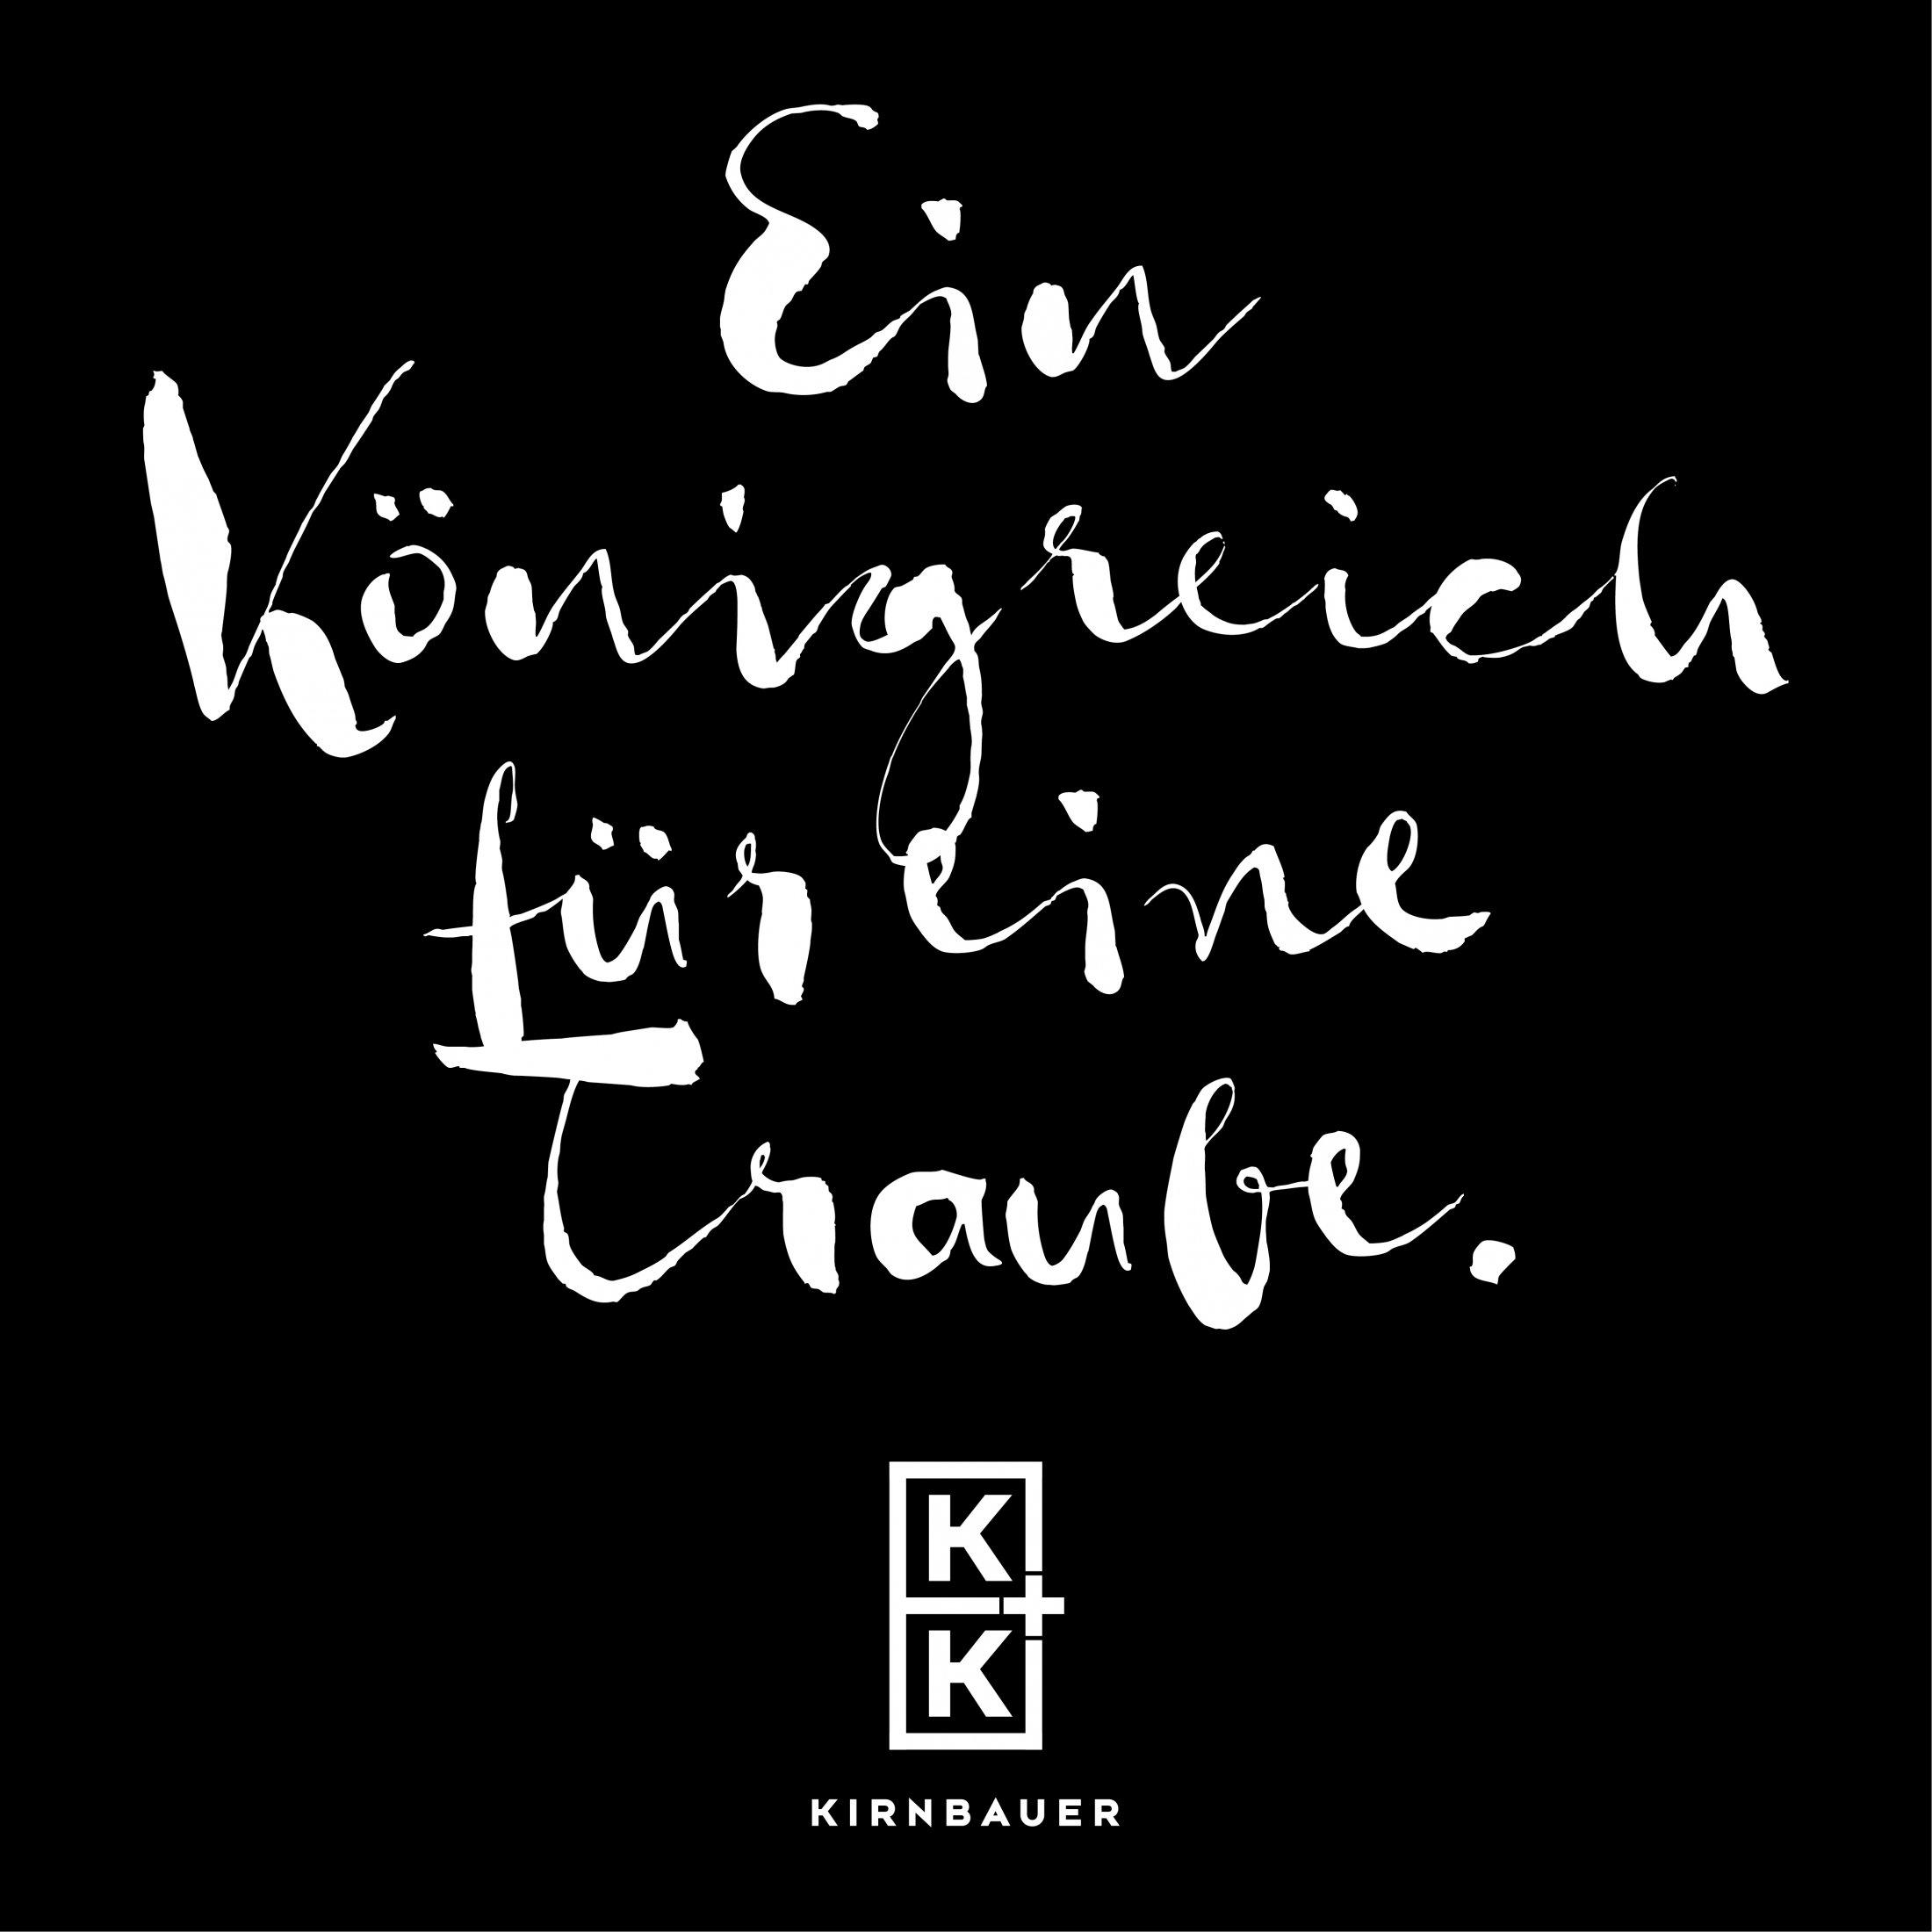 K+K-Kirnbauer Marke+Slogan B 1C Neg